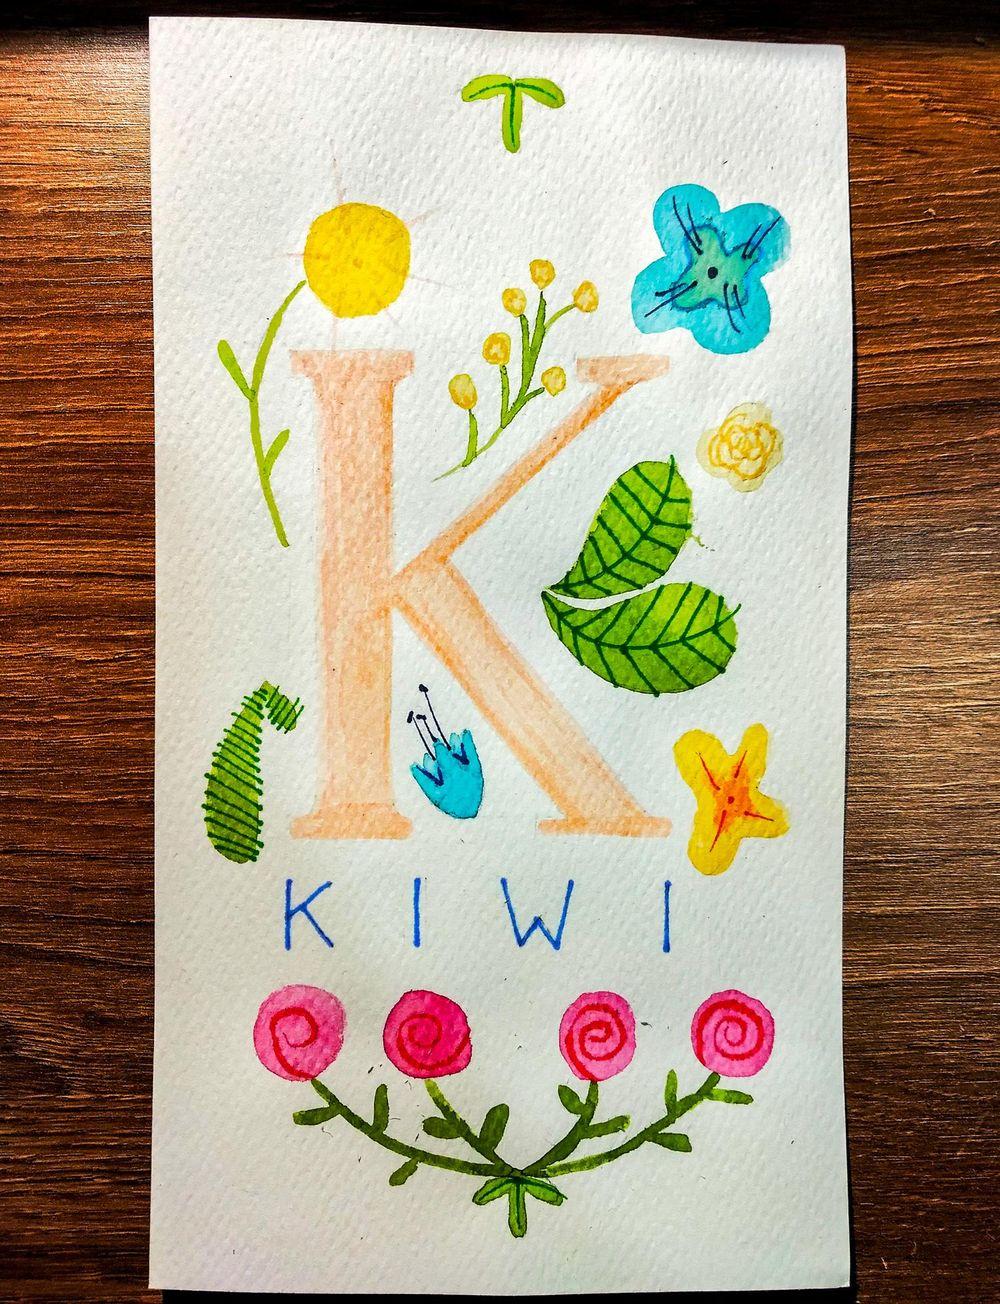 Kiwi - image 1 - student project